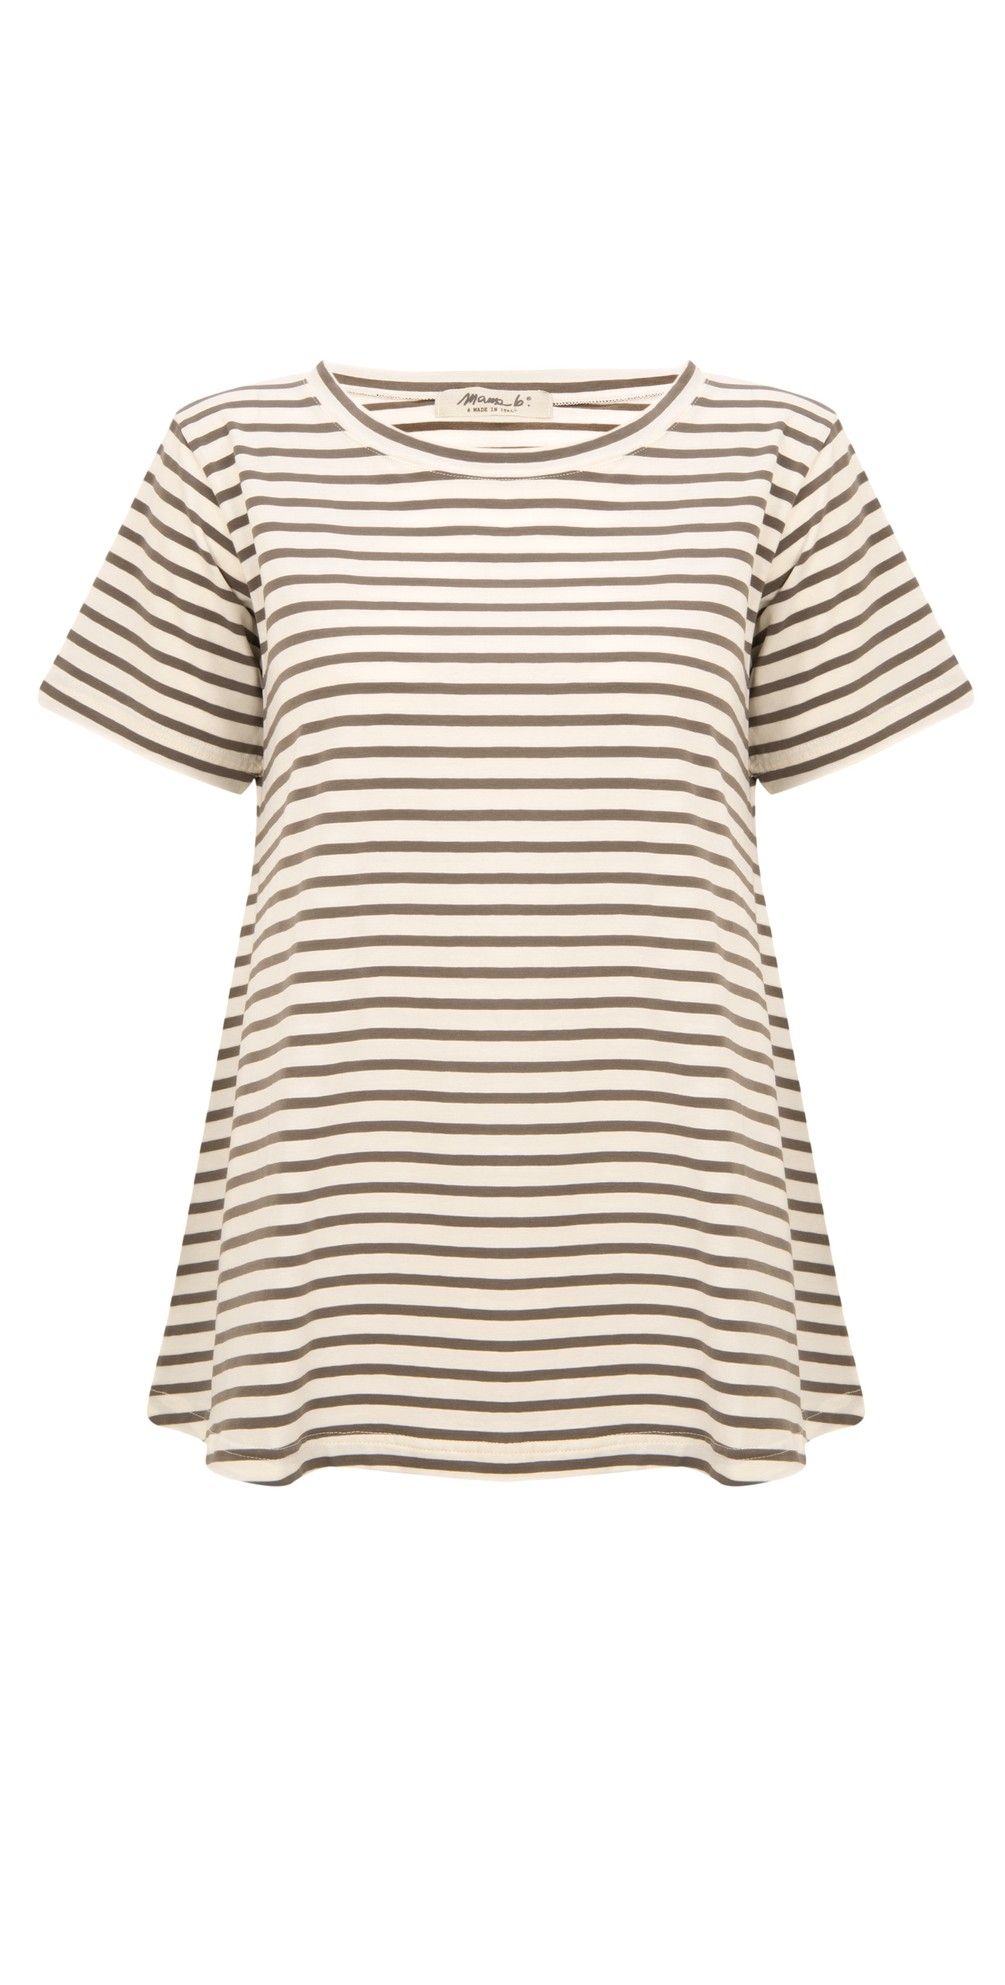 Atollo R Stripe T-Shirt main image